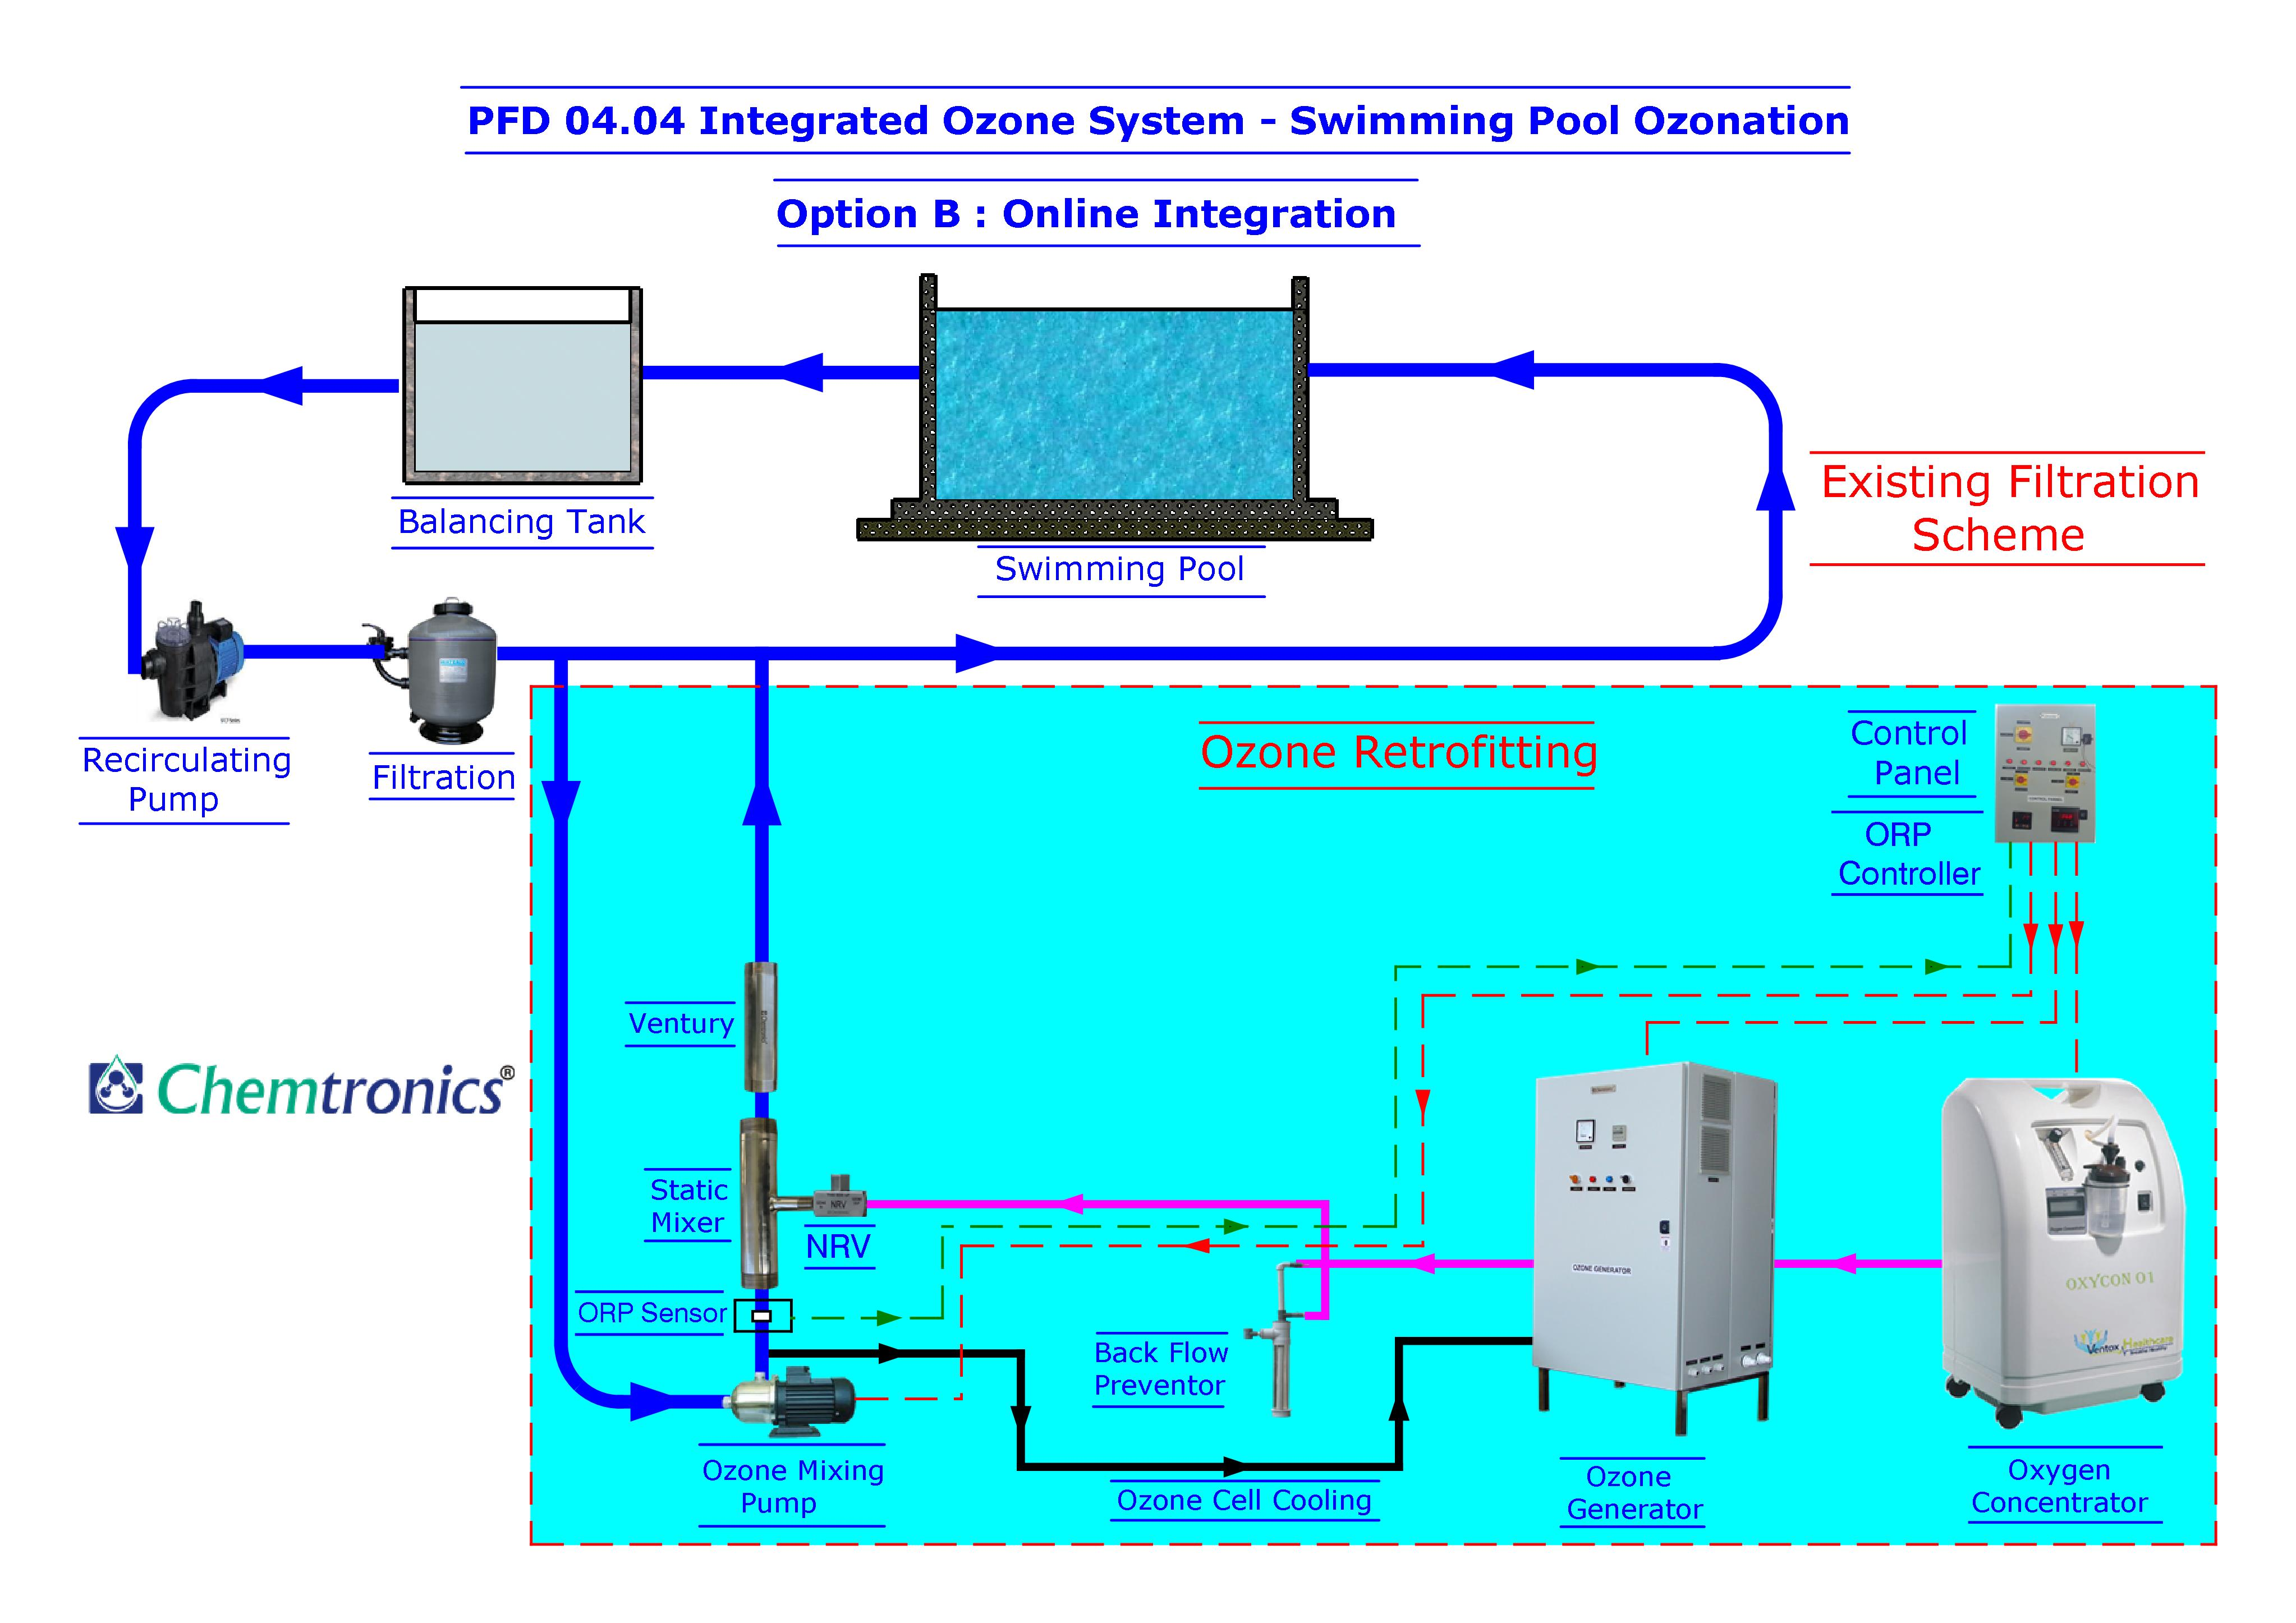 PFD 04.04 Option B Online Integration for Swimming Pool Ozonation